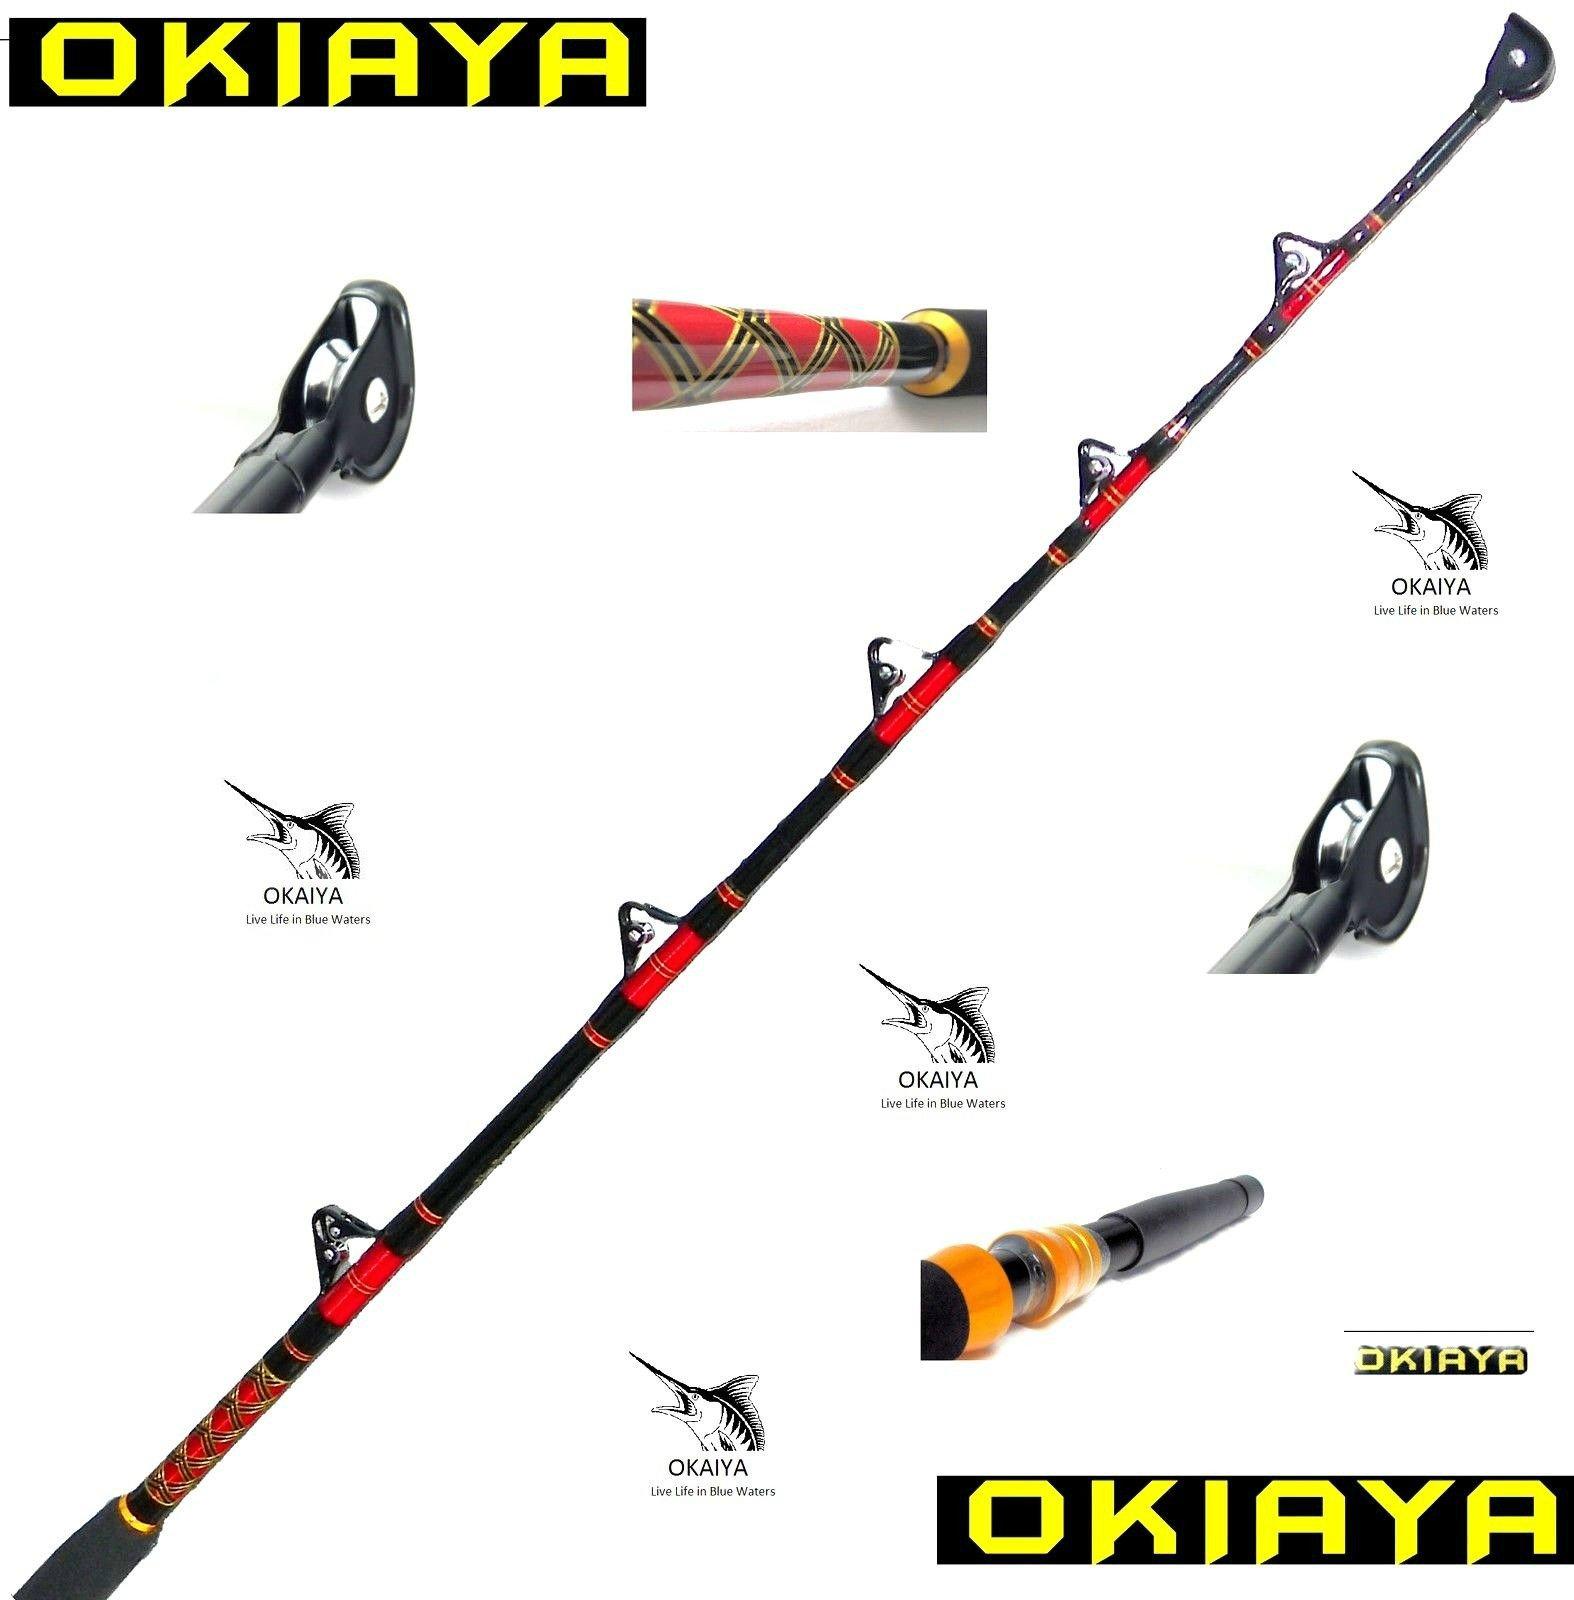 OKIAYA COMPOSIT 80130LB Saltwater Big Game Roller Rod